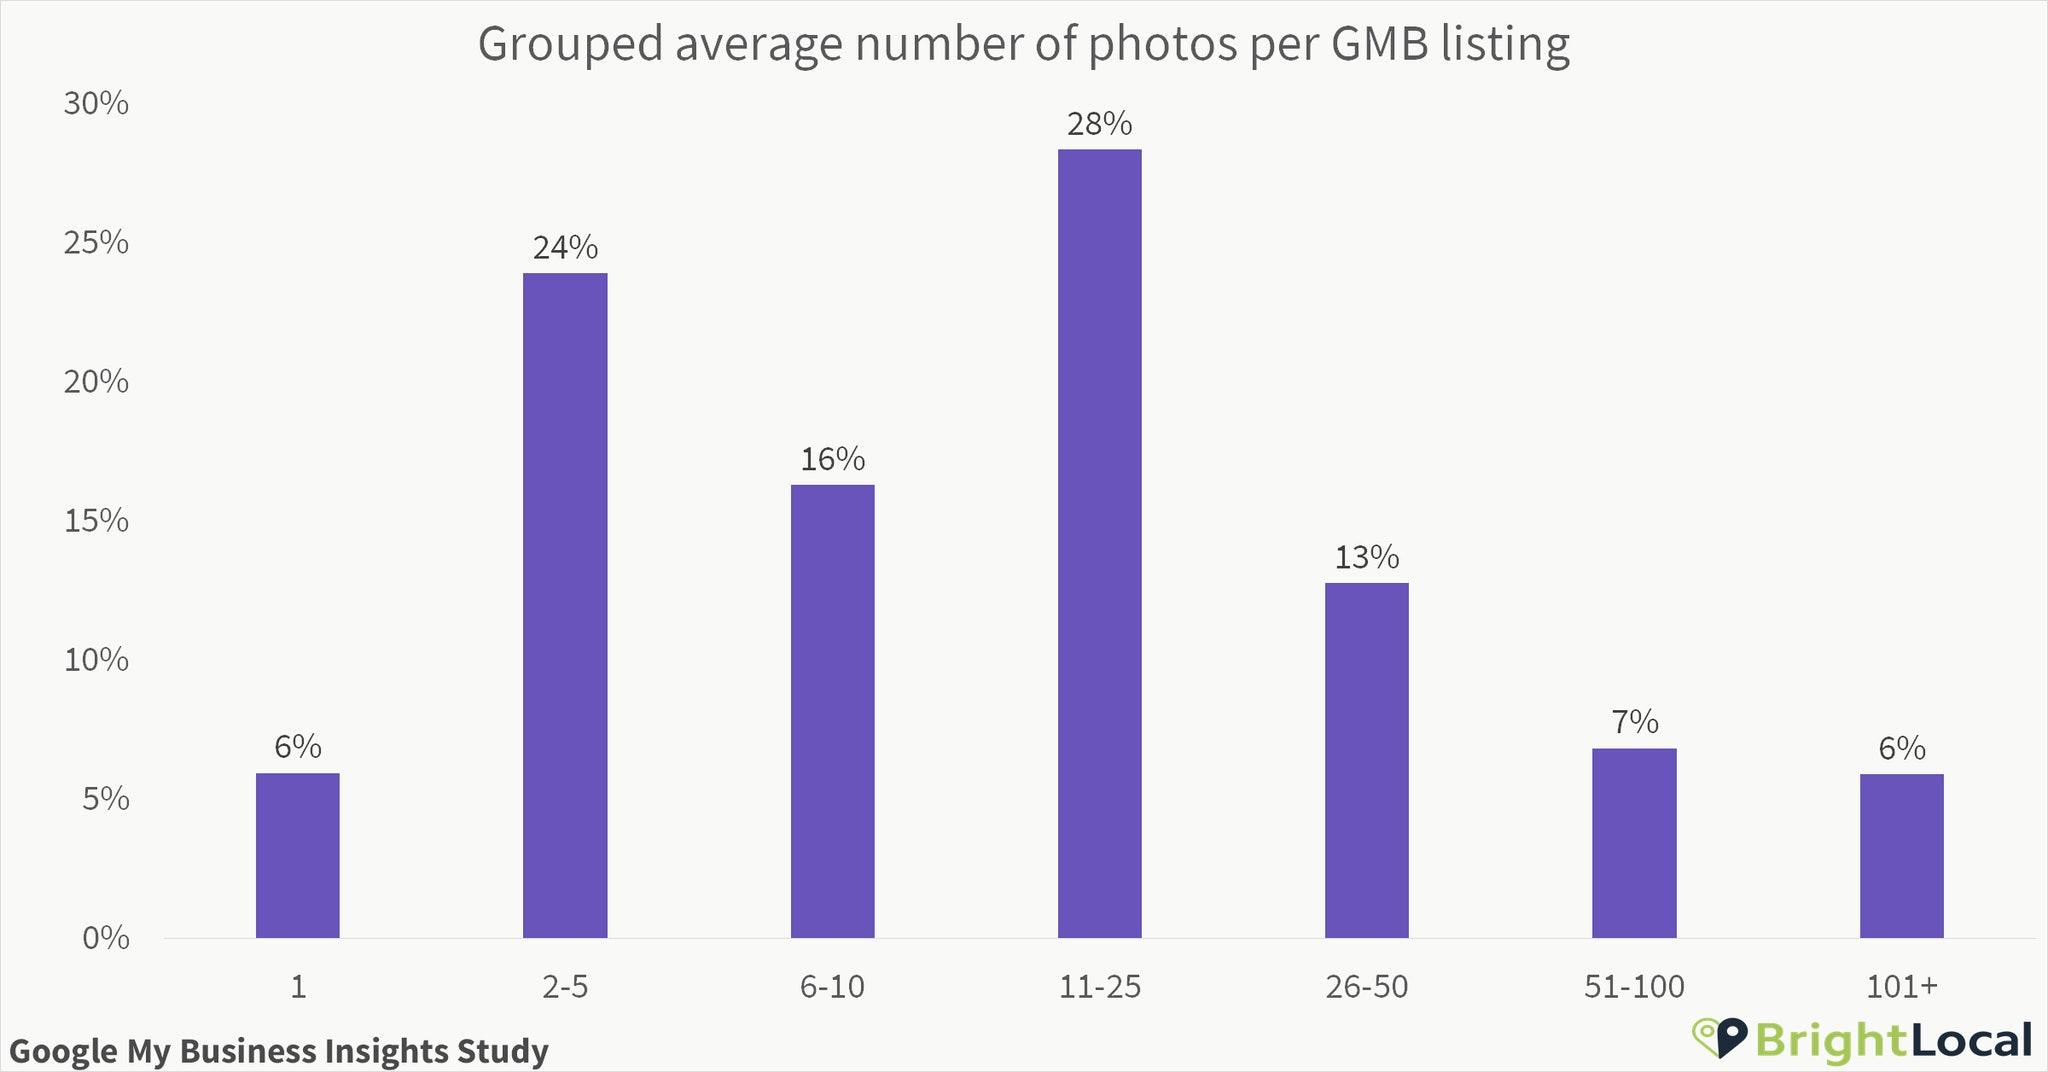 Googleマイビジネス上の画像数平均